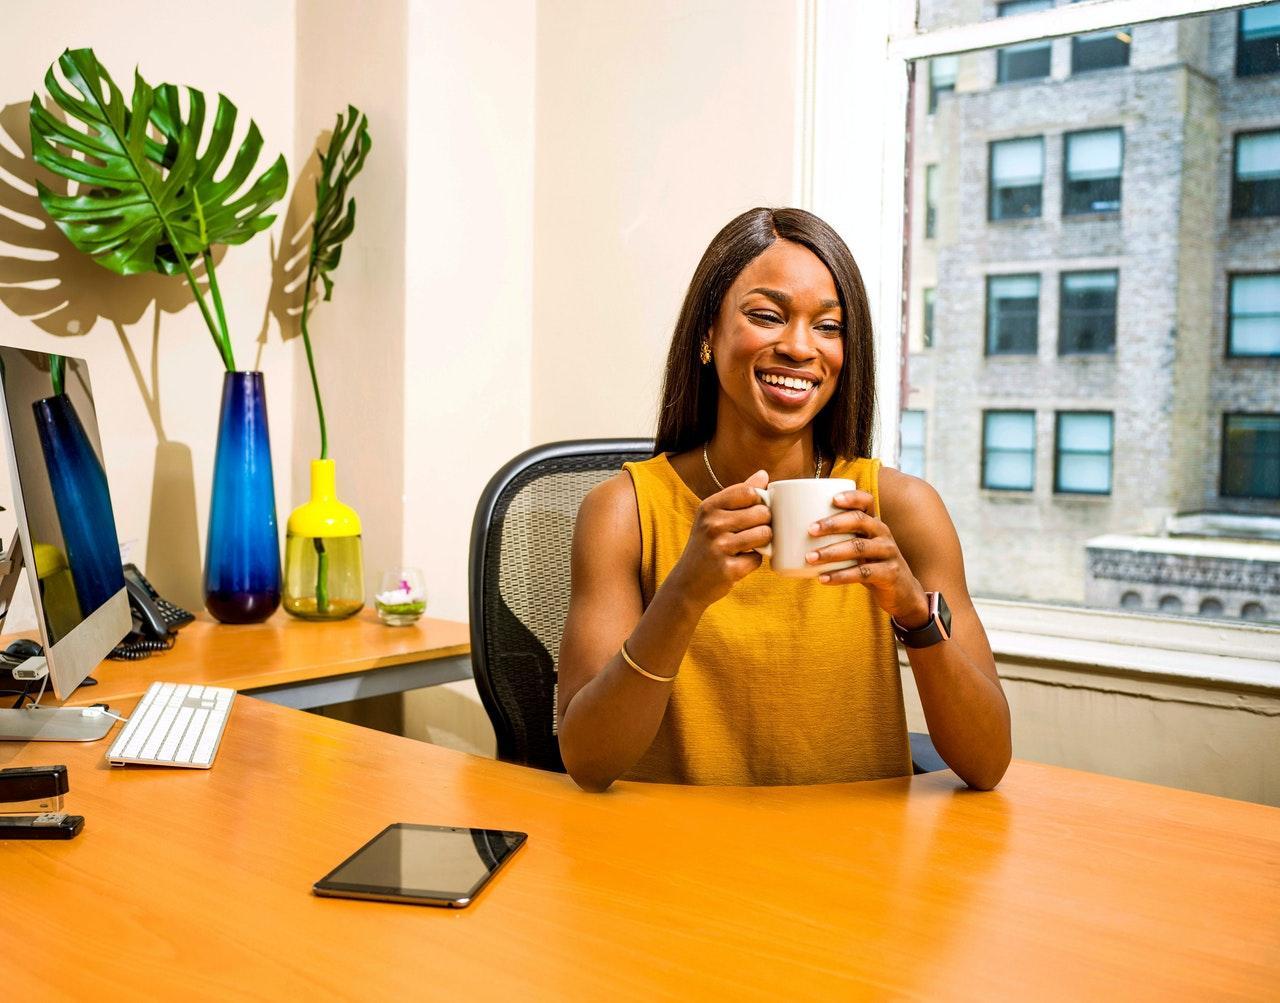 Woman Holding White Ceramic Mug At Desk